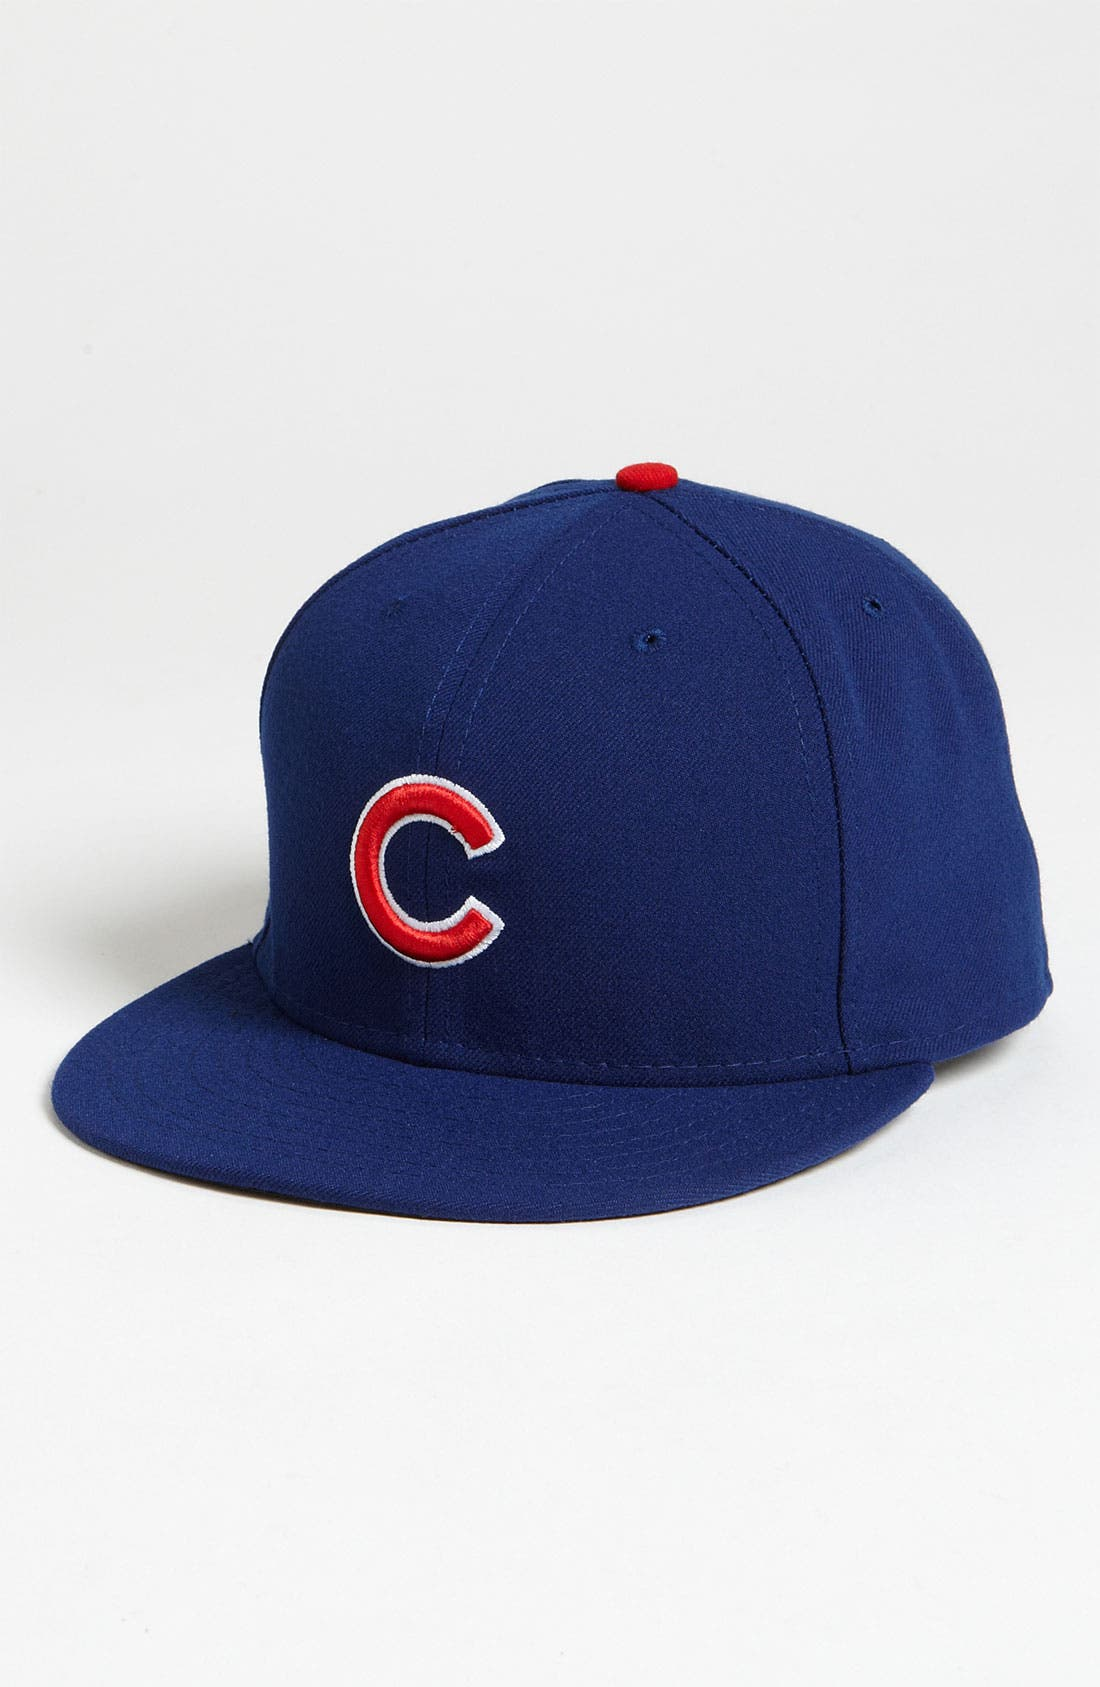 Main Image - New Era Cap 'Chicago Cubs' Baseball Cap